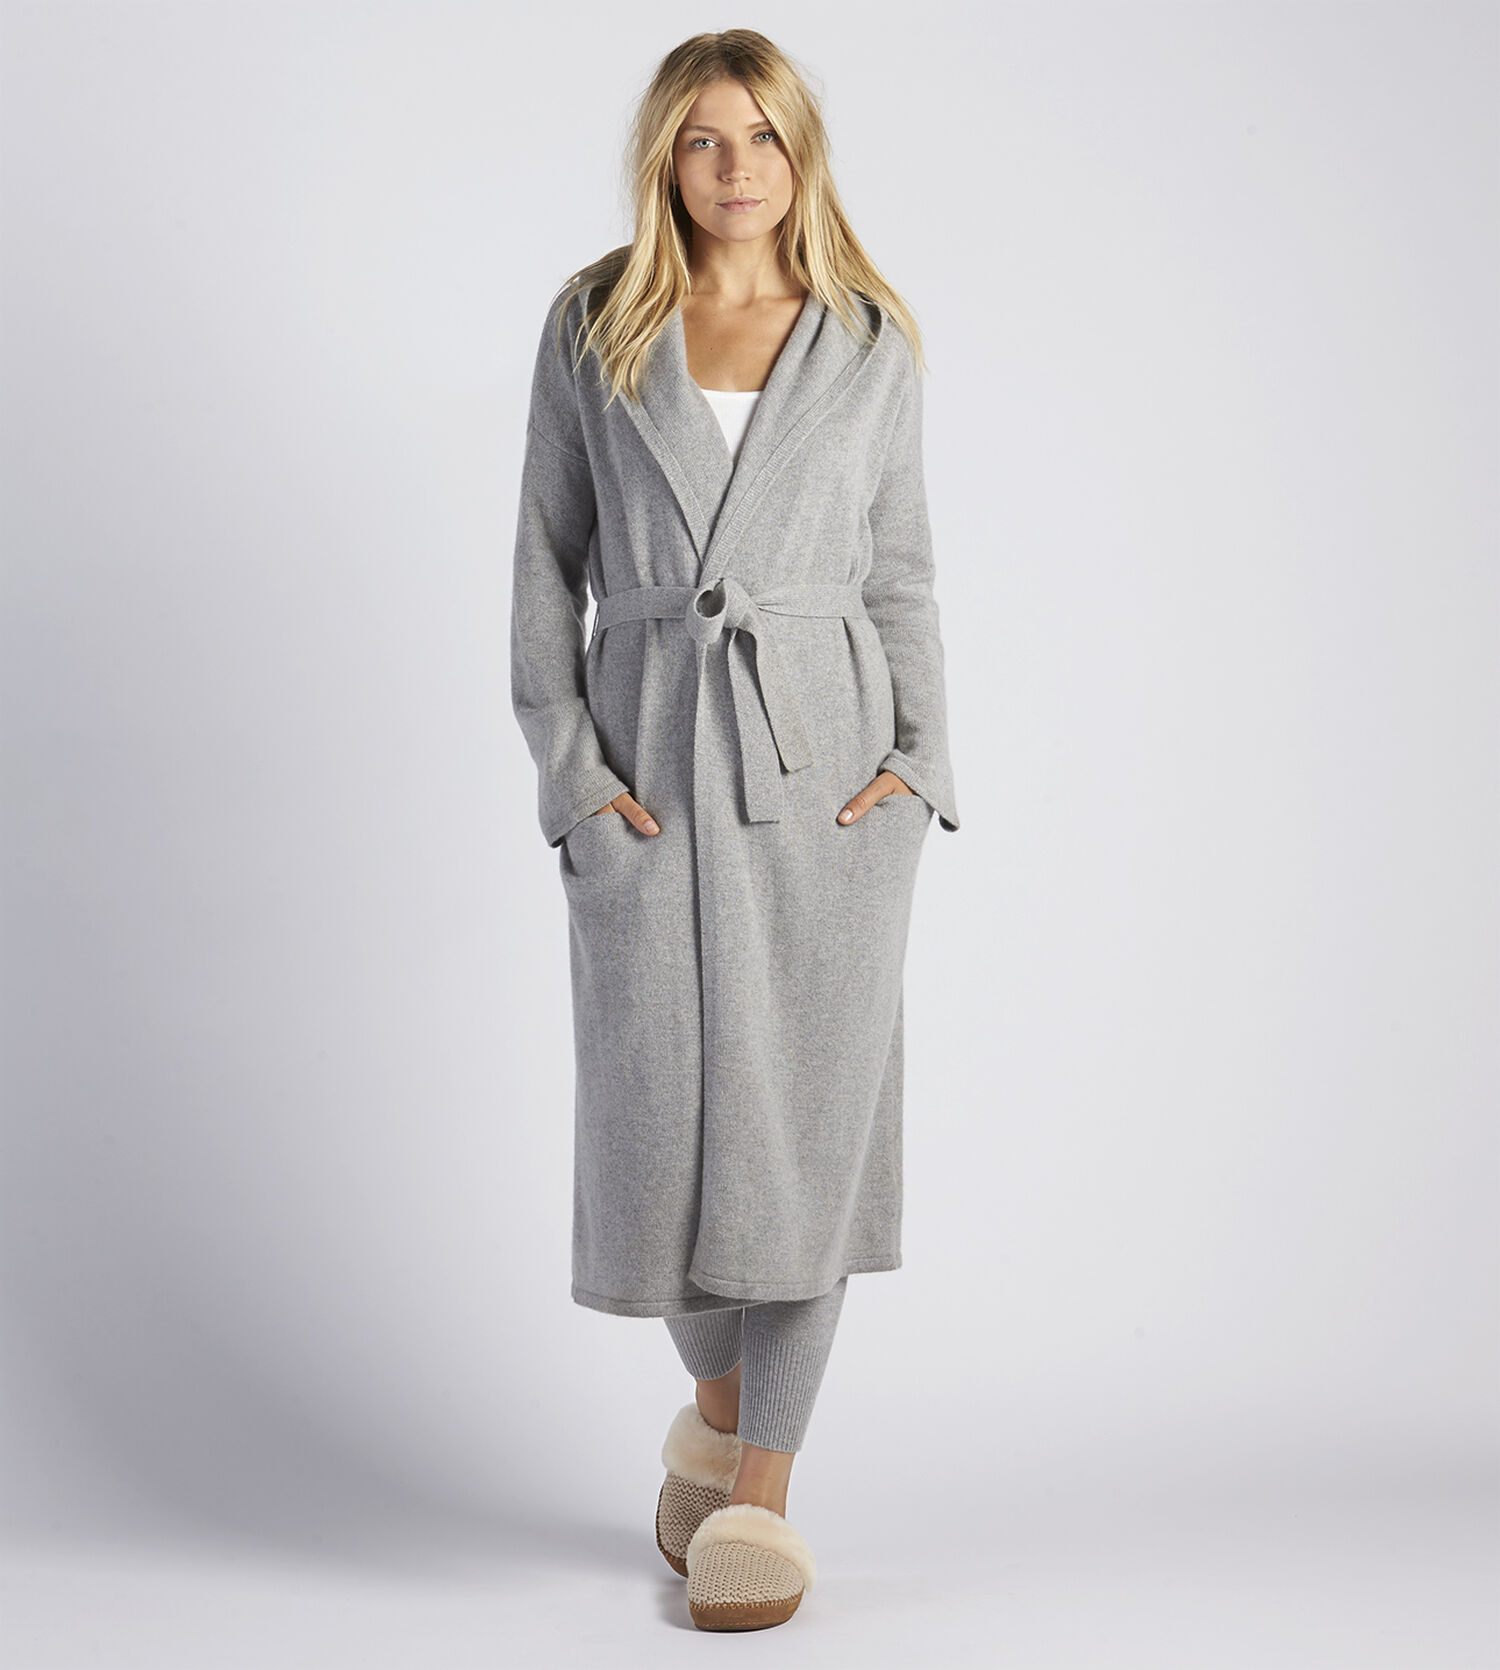 Robe: Women's Evie Cashmere Robe